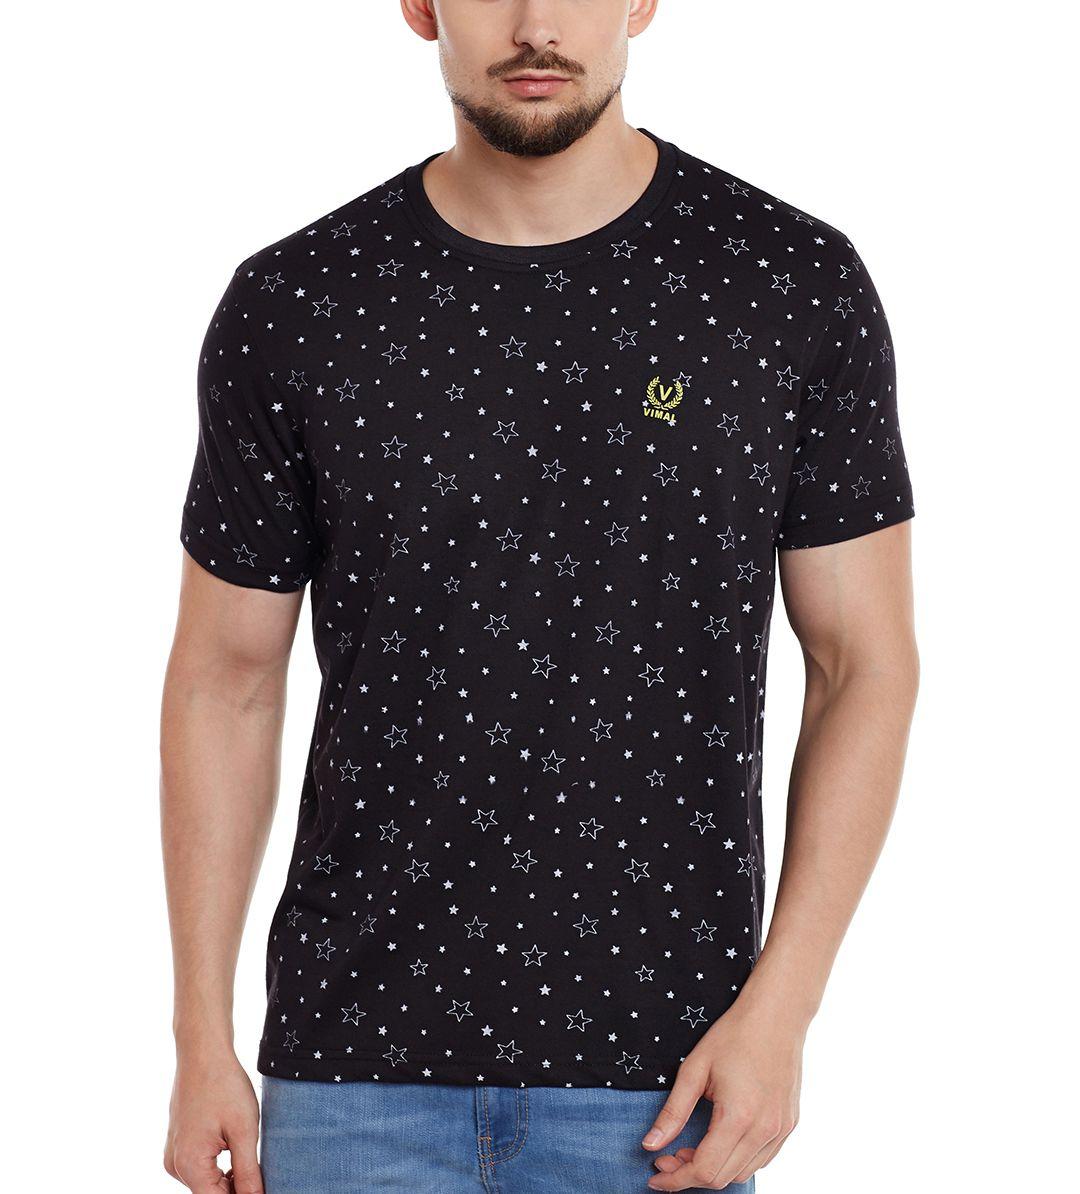 Vimal Black Round T-Shirt